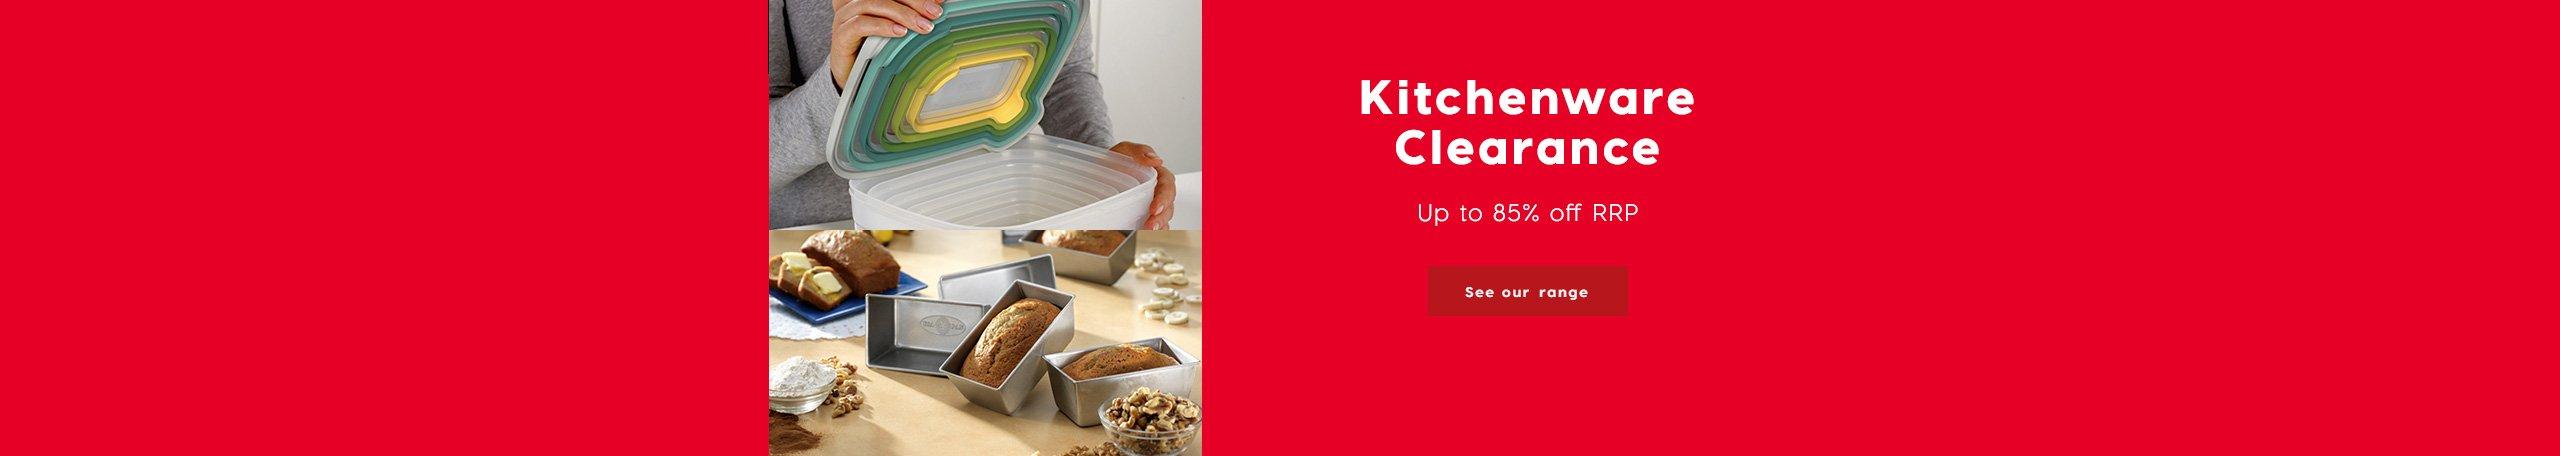 Kitchenware Clearance